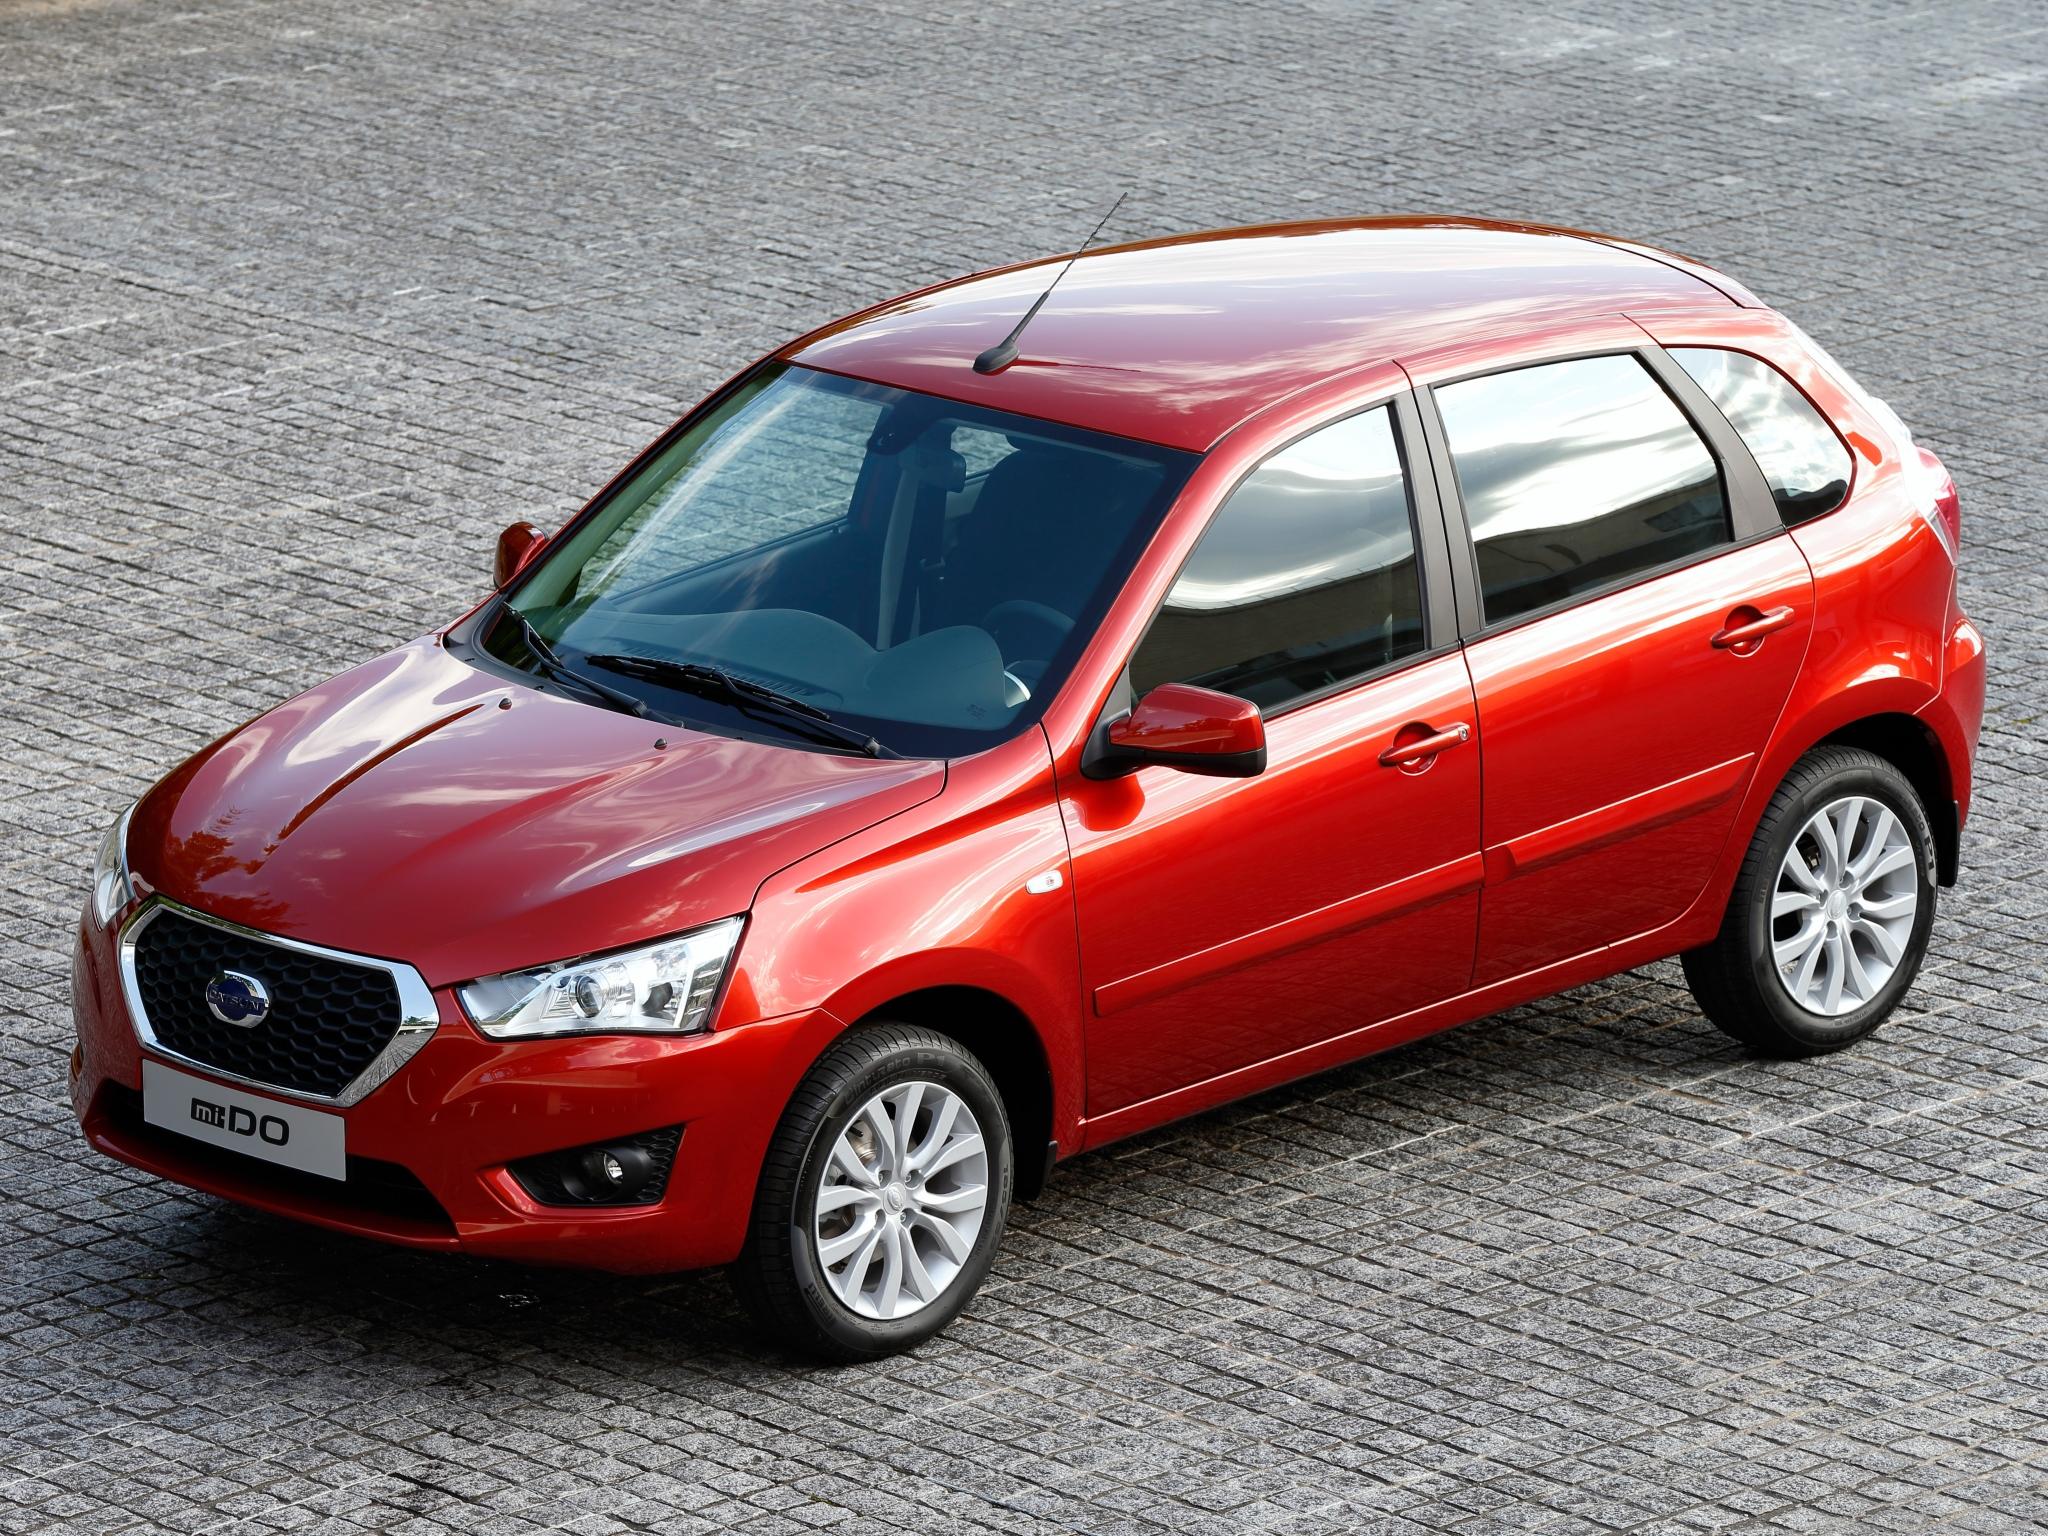 Datsun Reveals mi-DO Hatchback in Russia: Based on Lada Kalina [Video ...